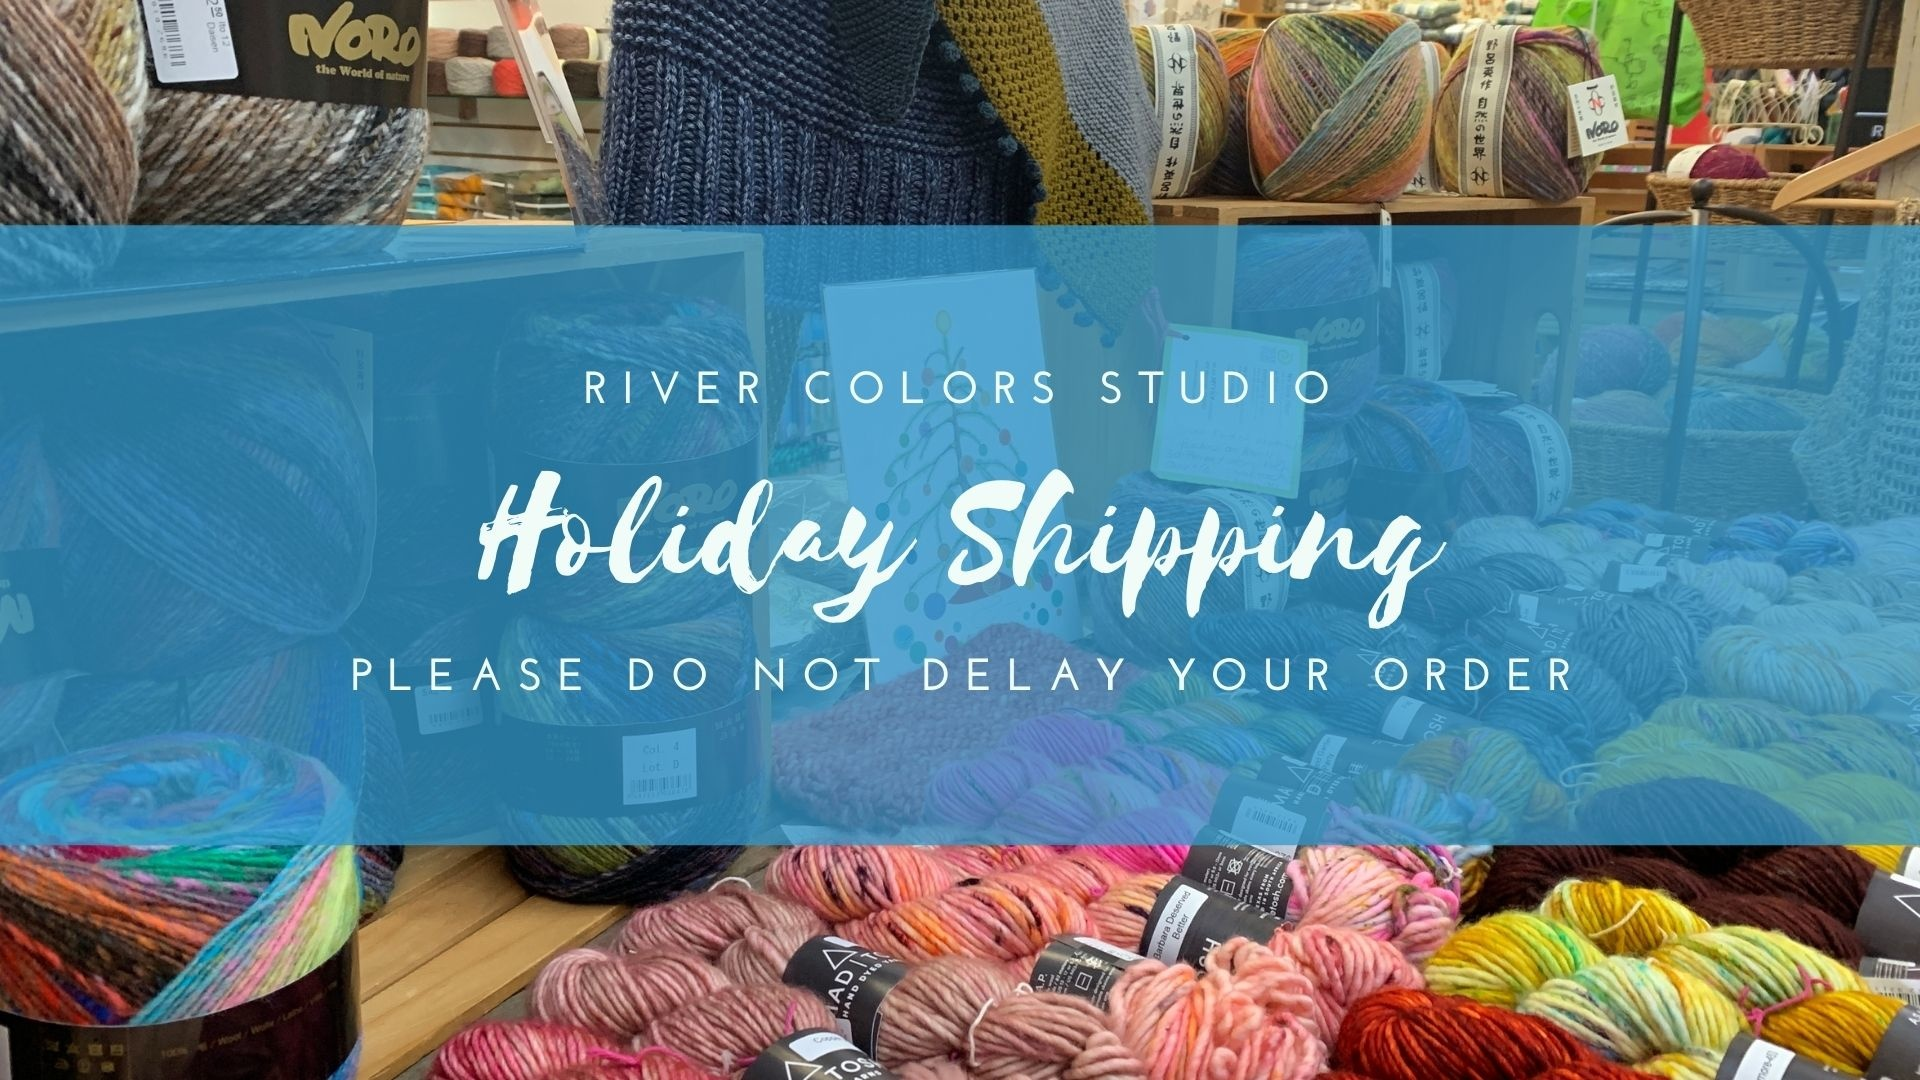 Holiday Shipping Delays